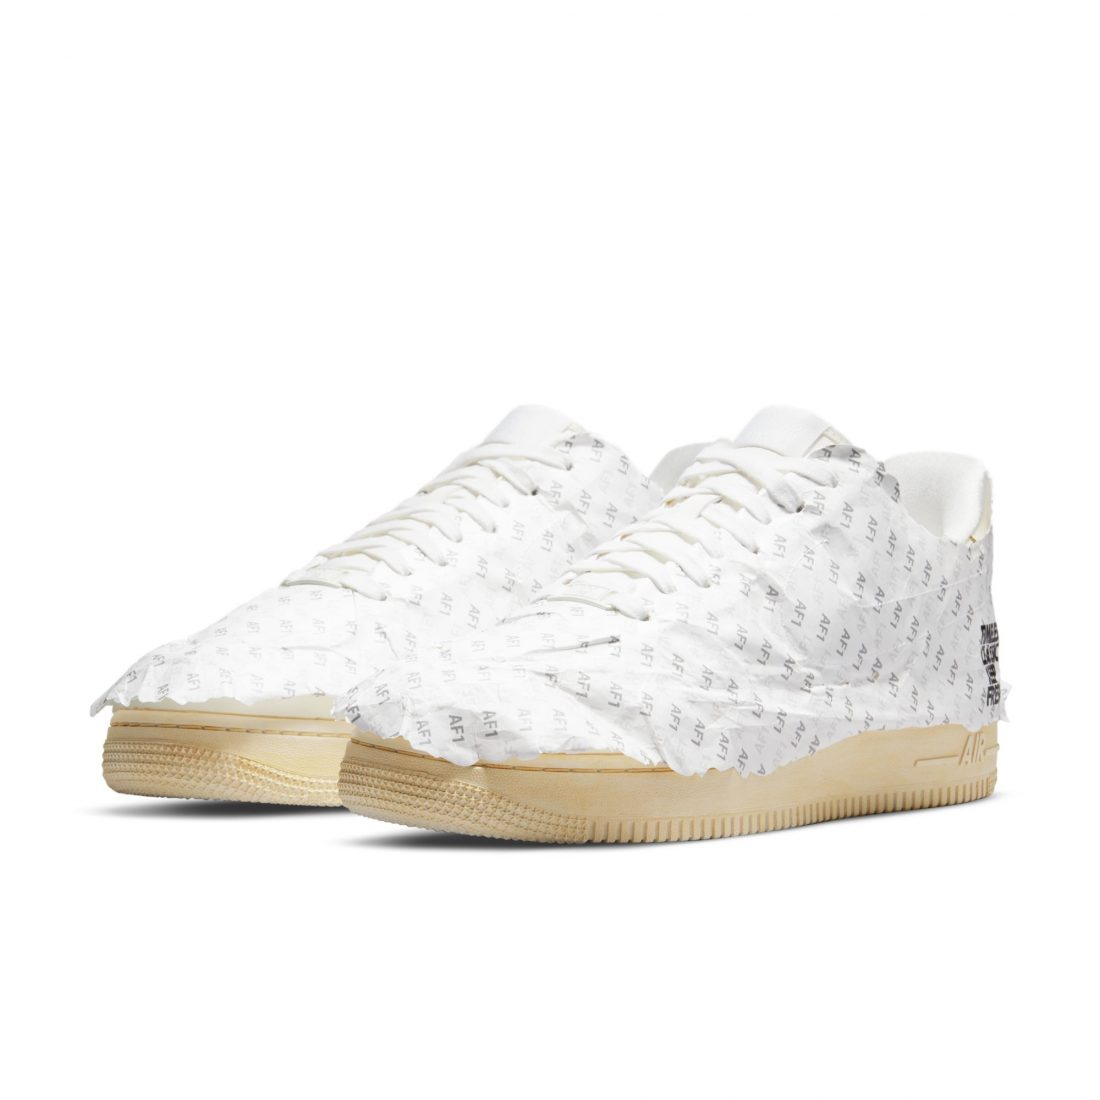 Nike Air Force 1 Low « Keep 'Em Fresh »